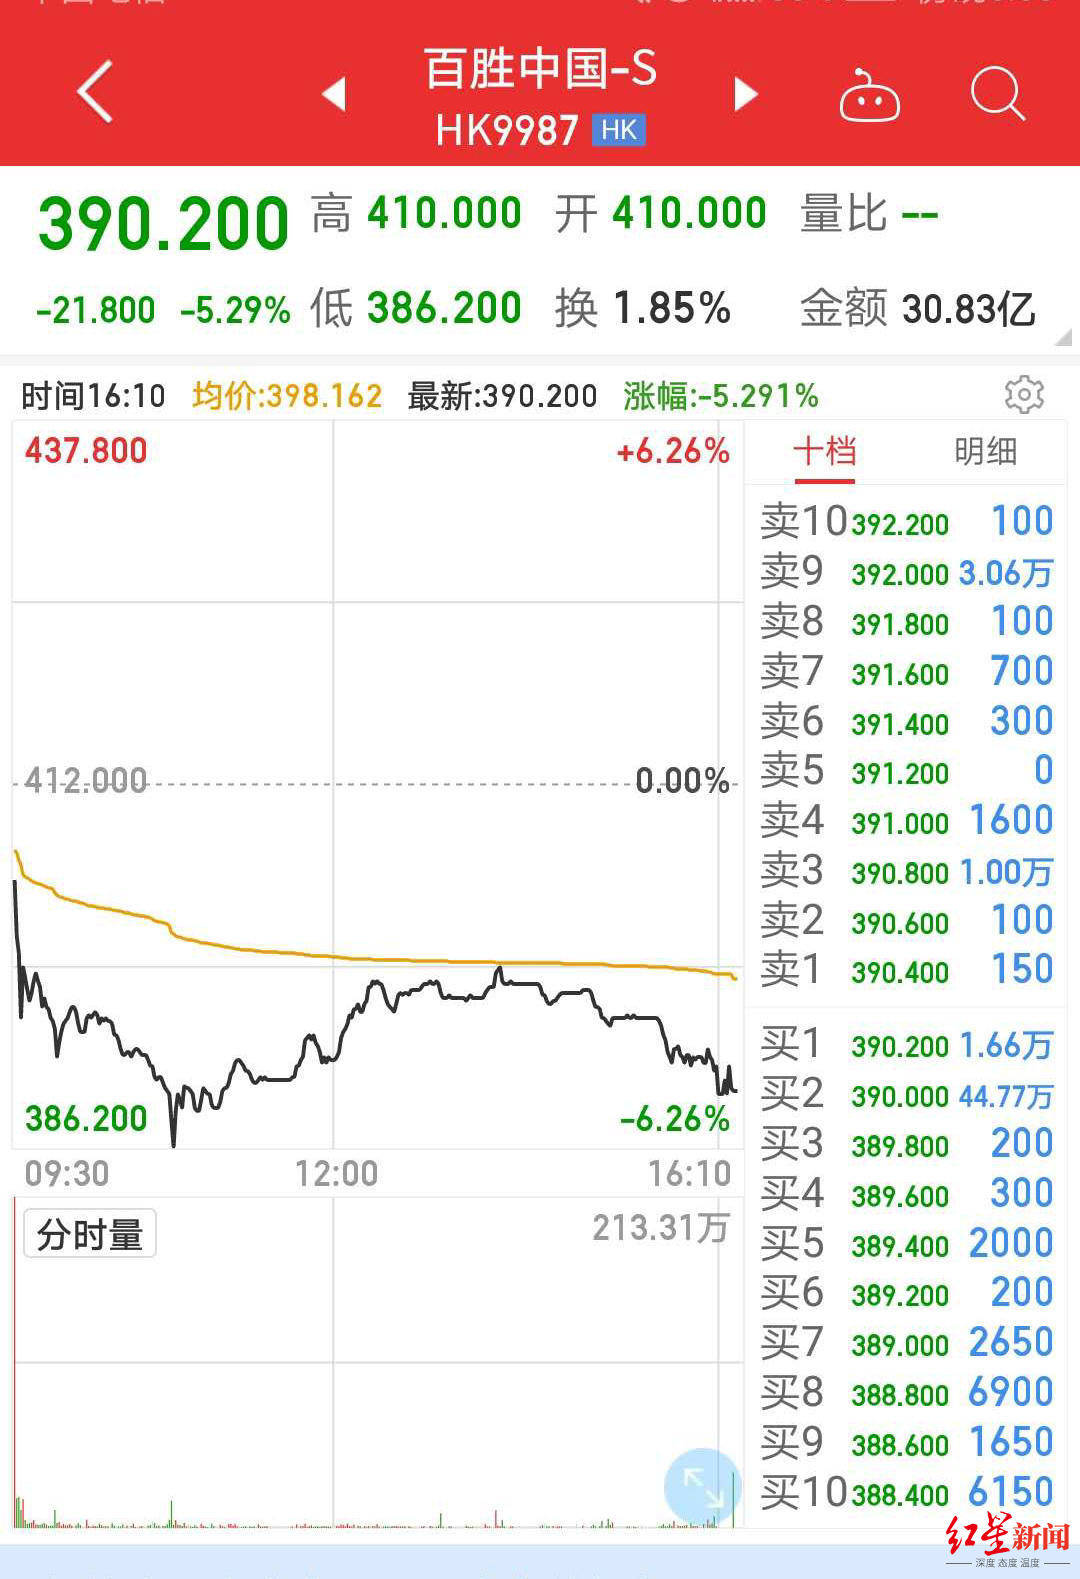 <strong>百胜中国港股首日挂牌跌5%,新投资者浮</strong>